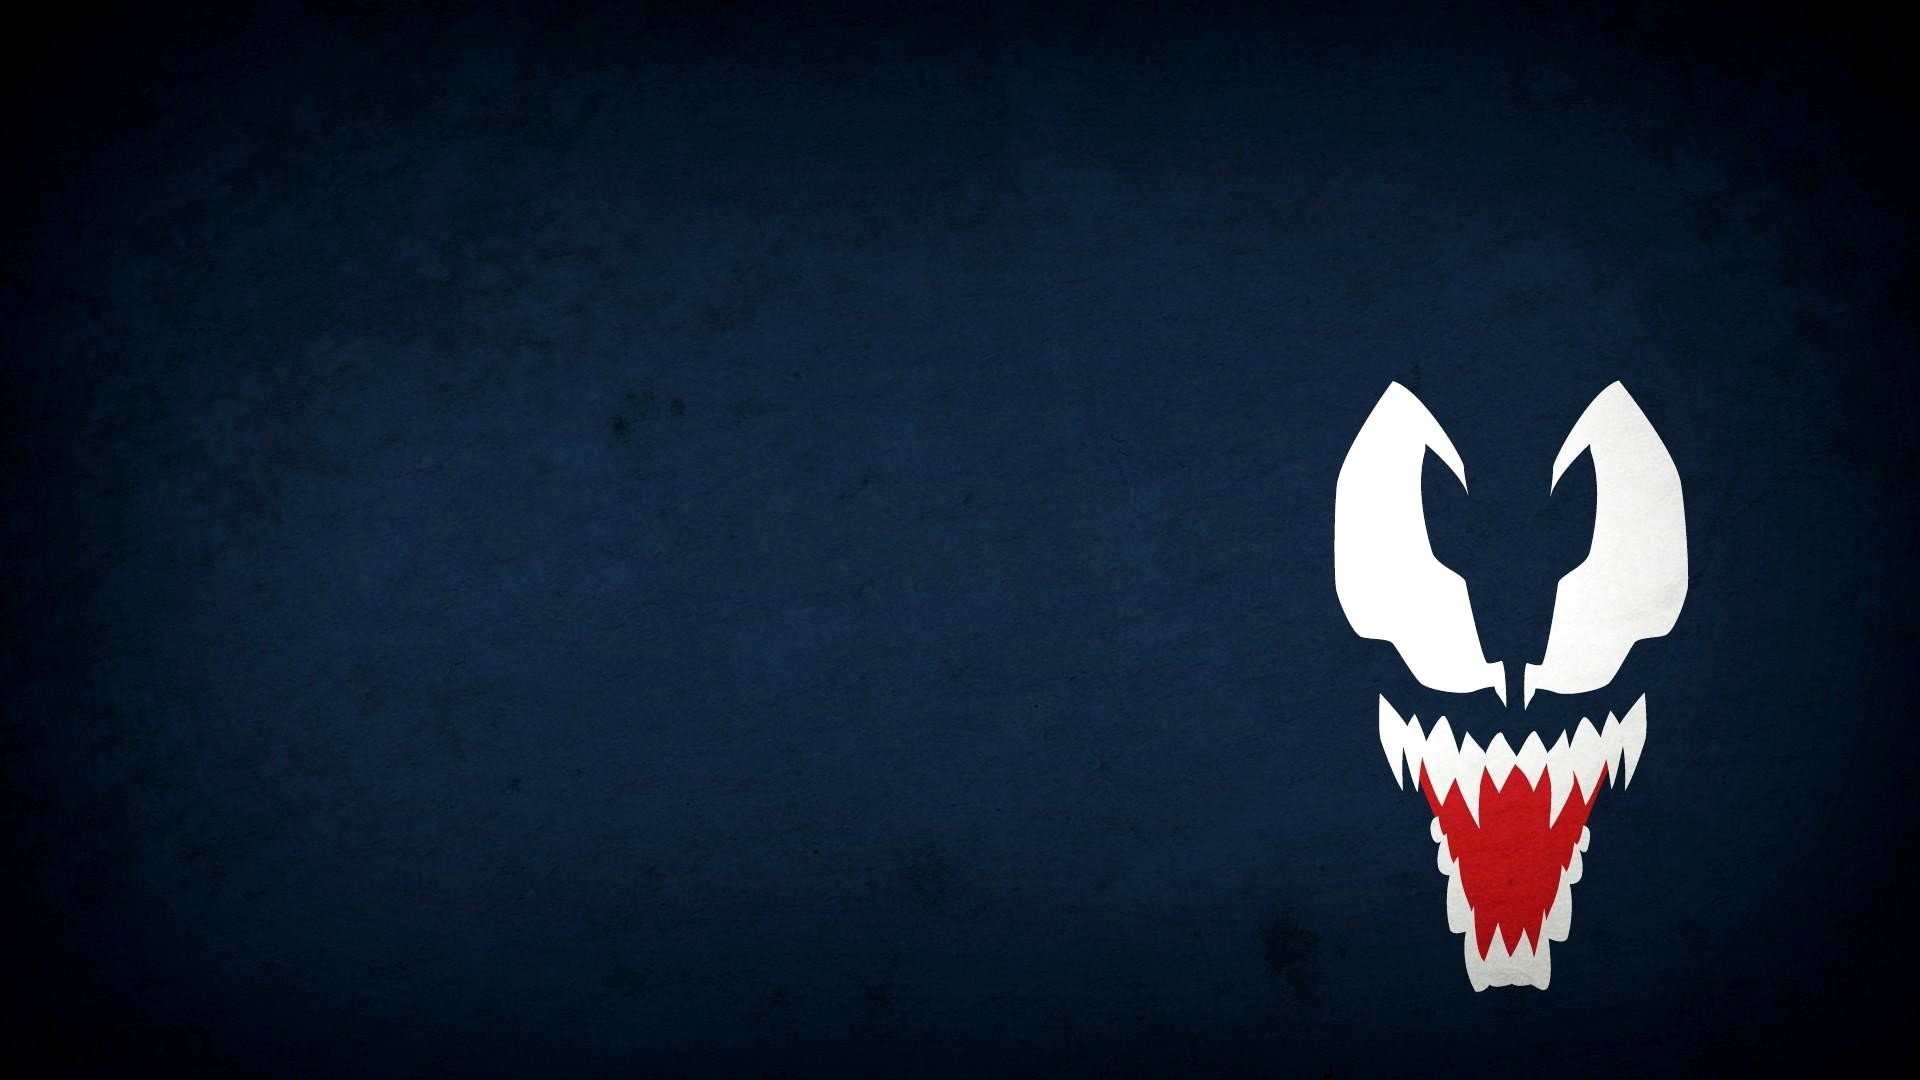 … Spiderman Venom Wallpapers   Wallpaper Cave